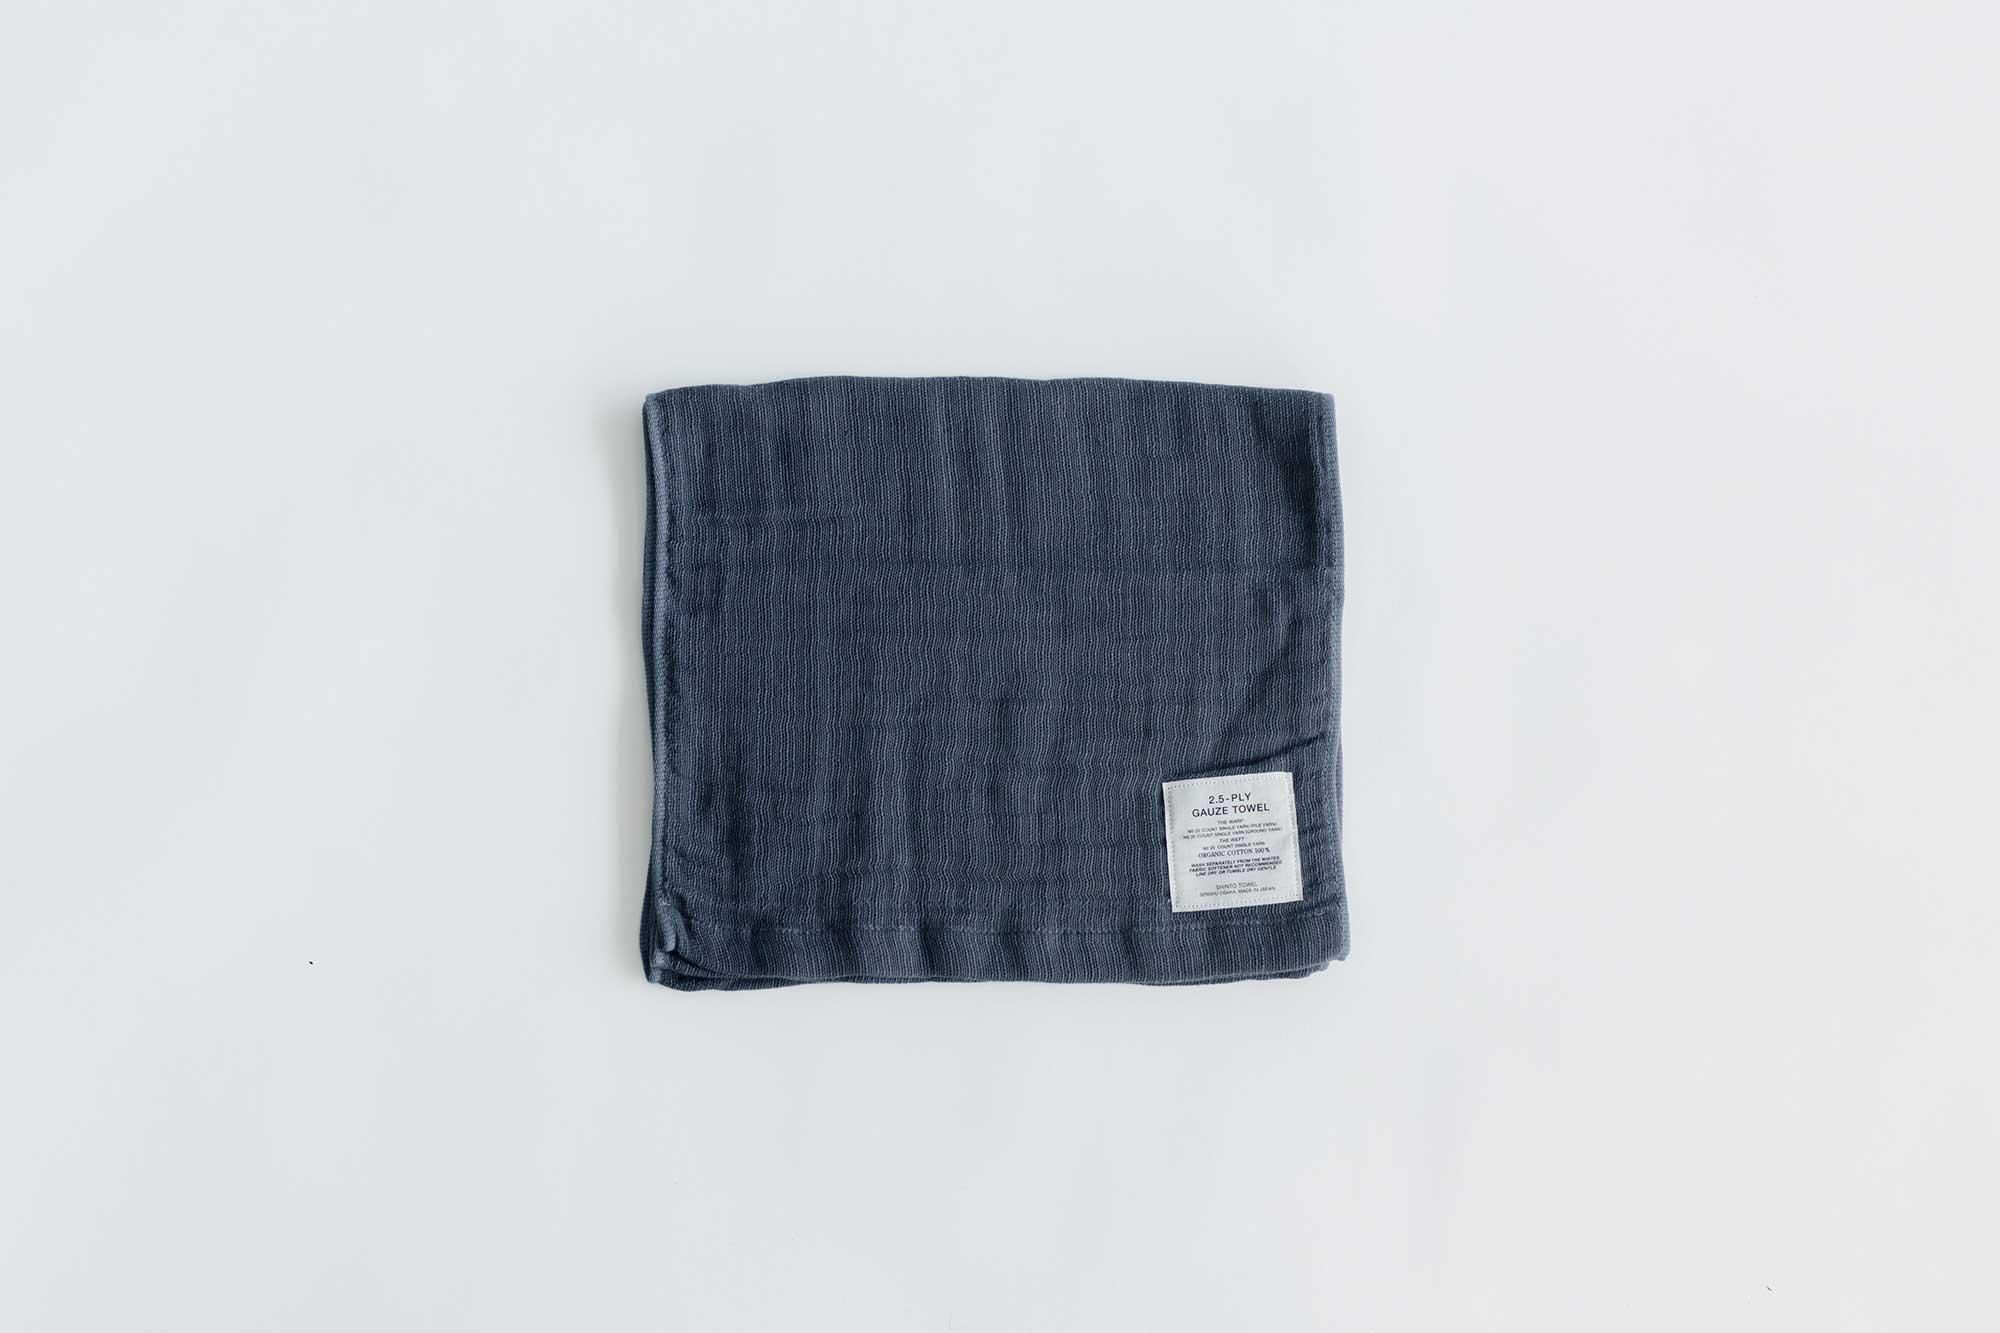 SHINTO TOWEL 2.5-PLY GAUZE マフラータオル